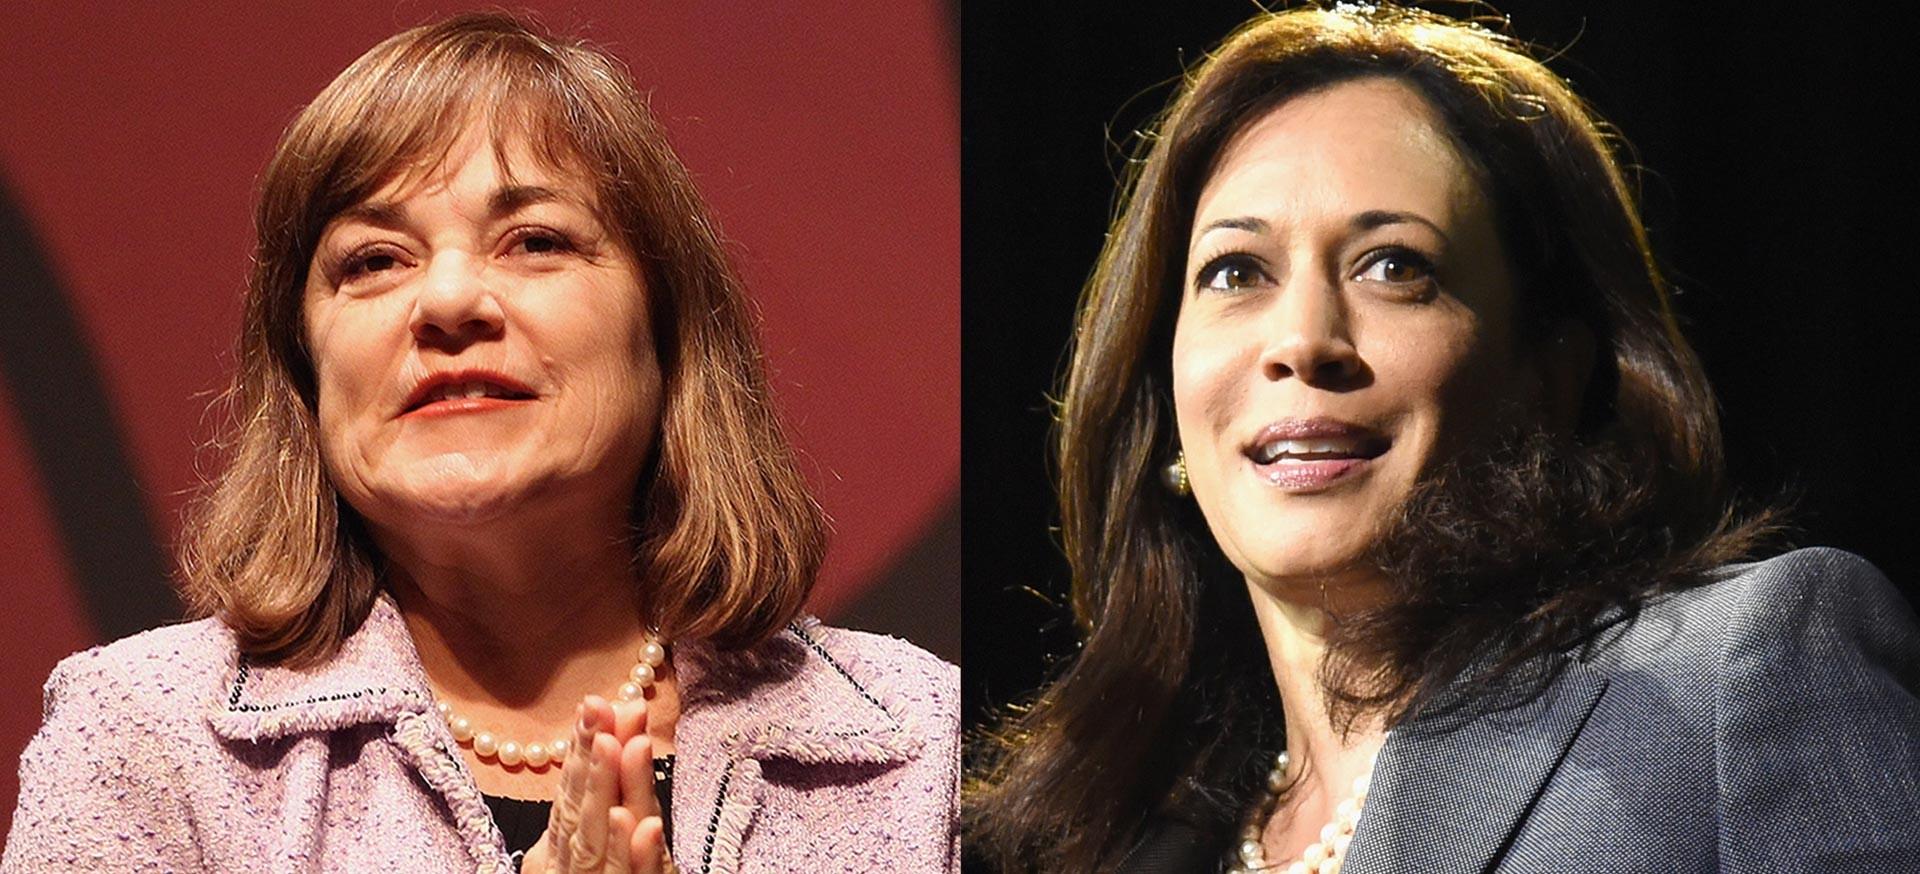 Rep. Loretta Sanchez (L) and Attorney General Kamala Harris.